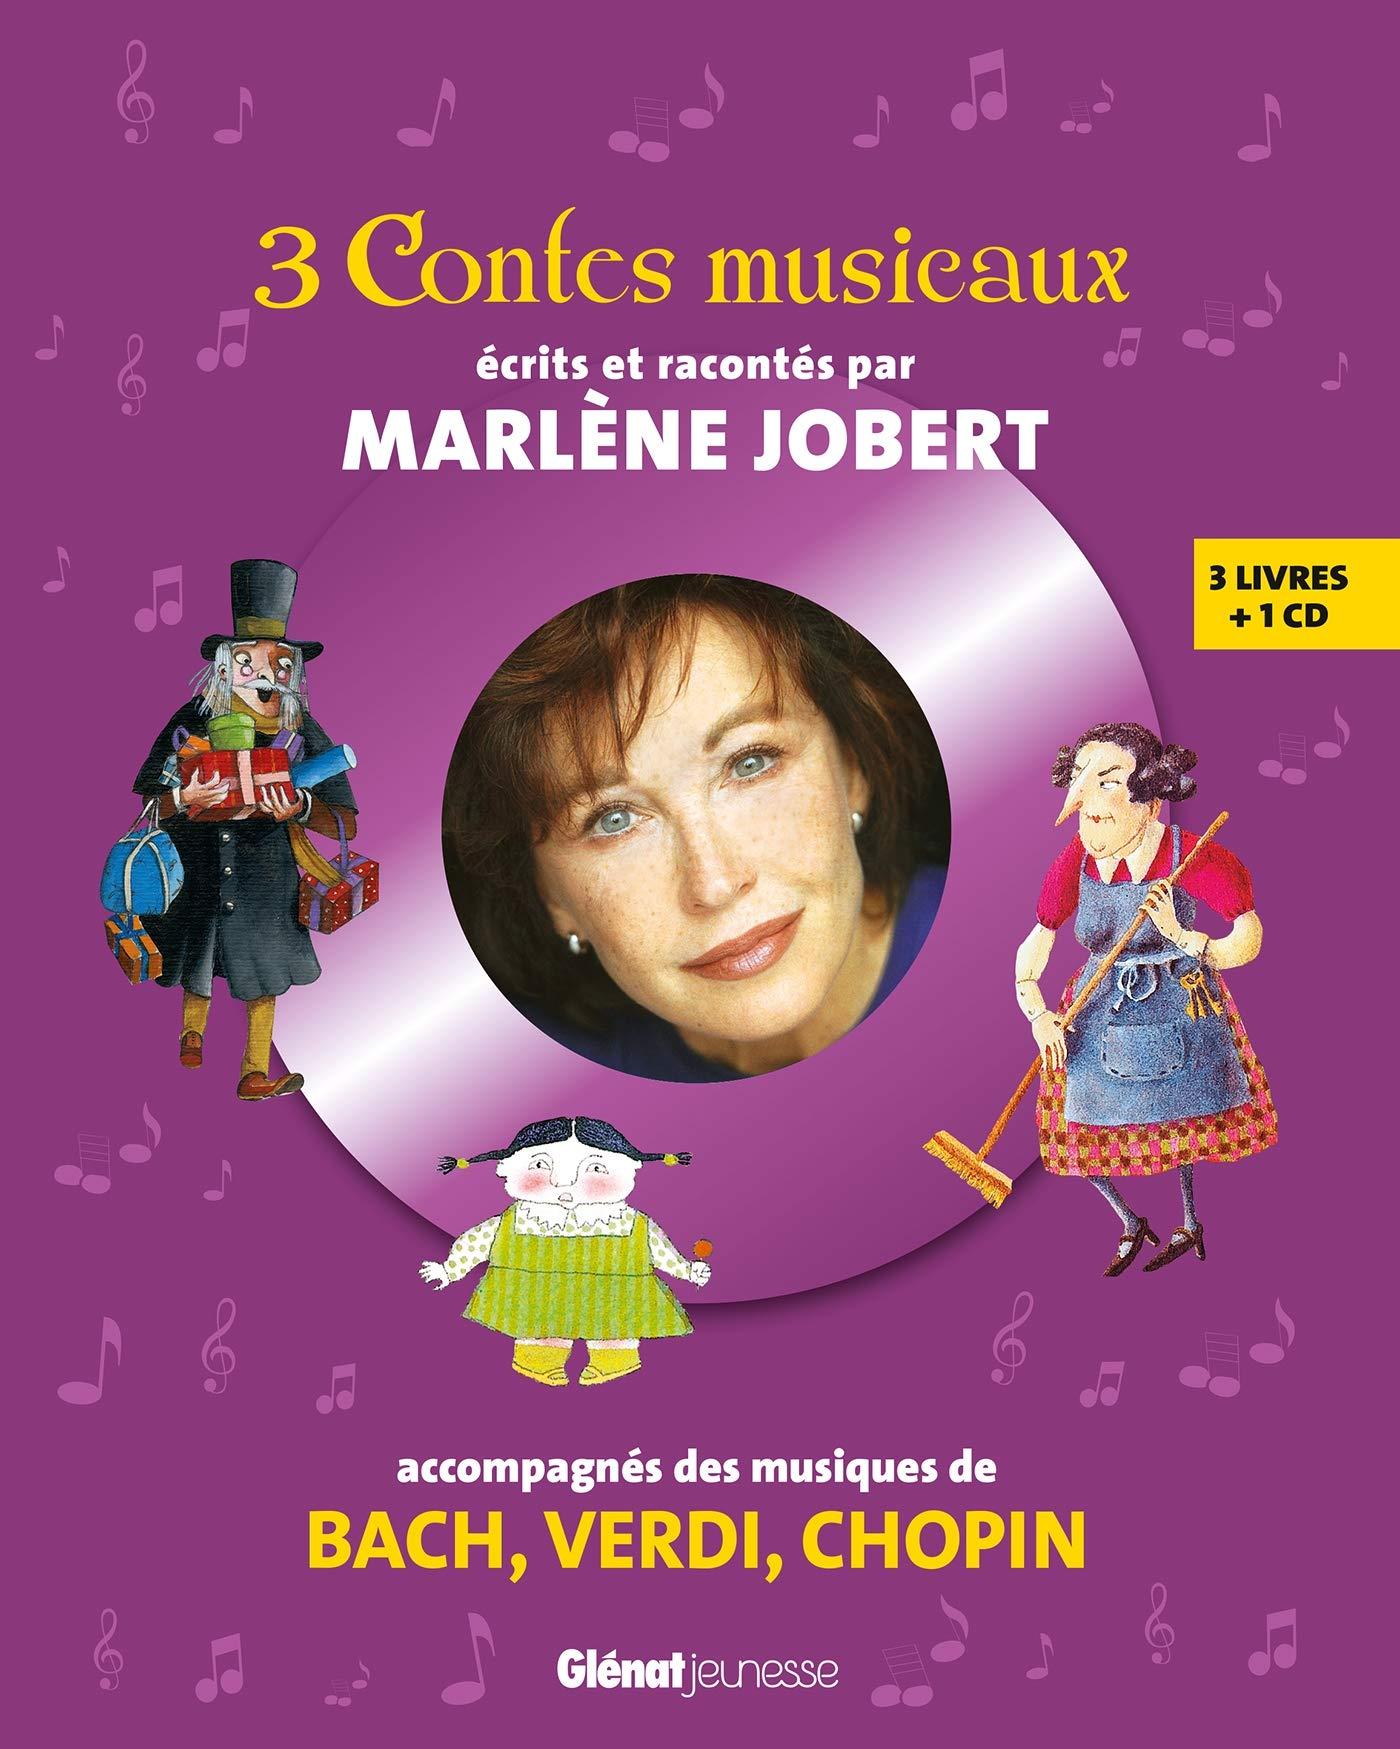 MARLÈNE CONTES MUSICAUX JOBERT TÉLÉCHARGER